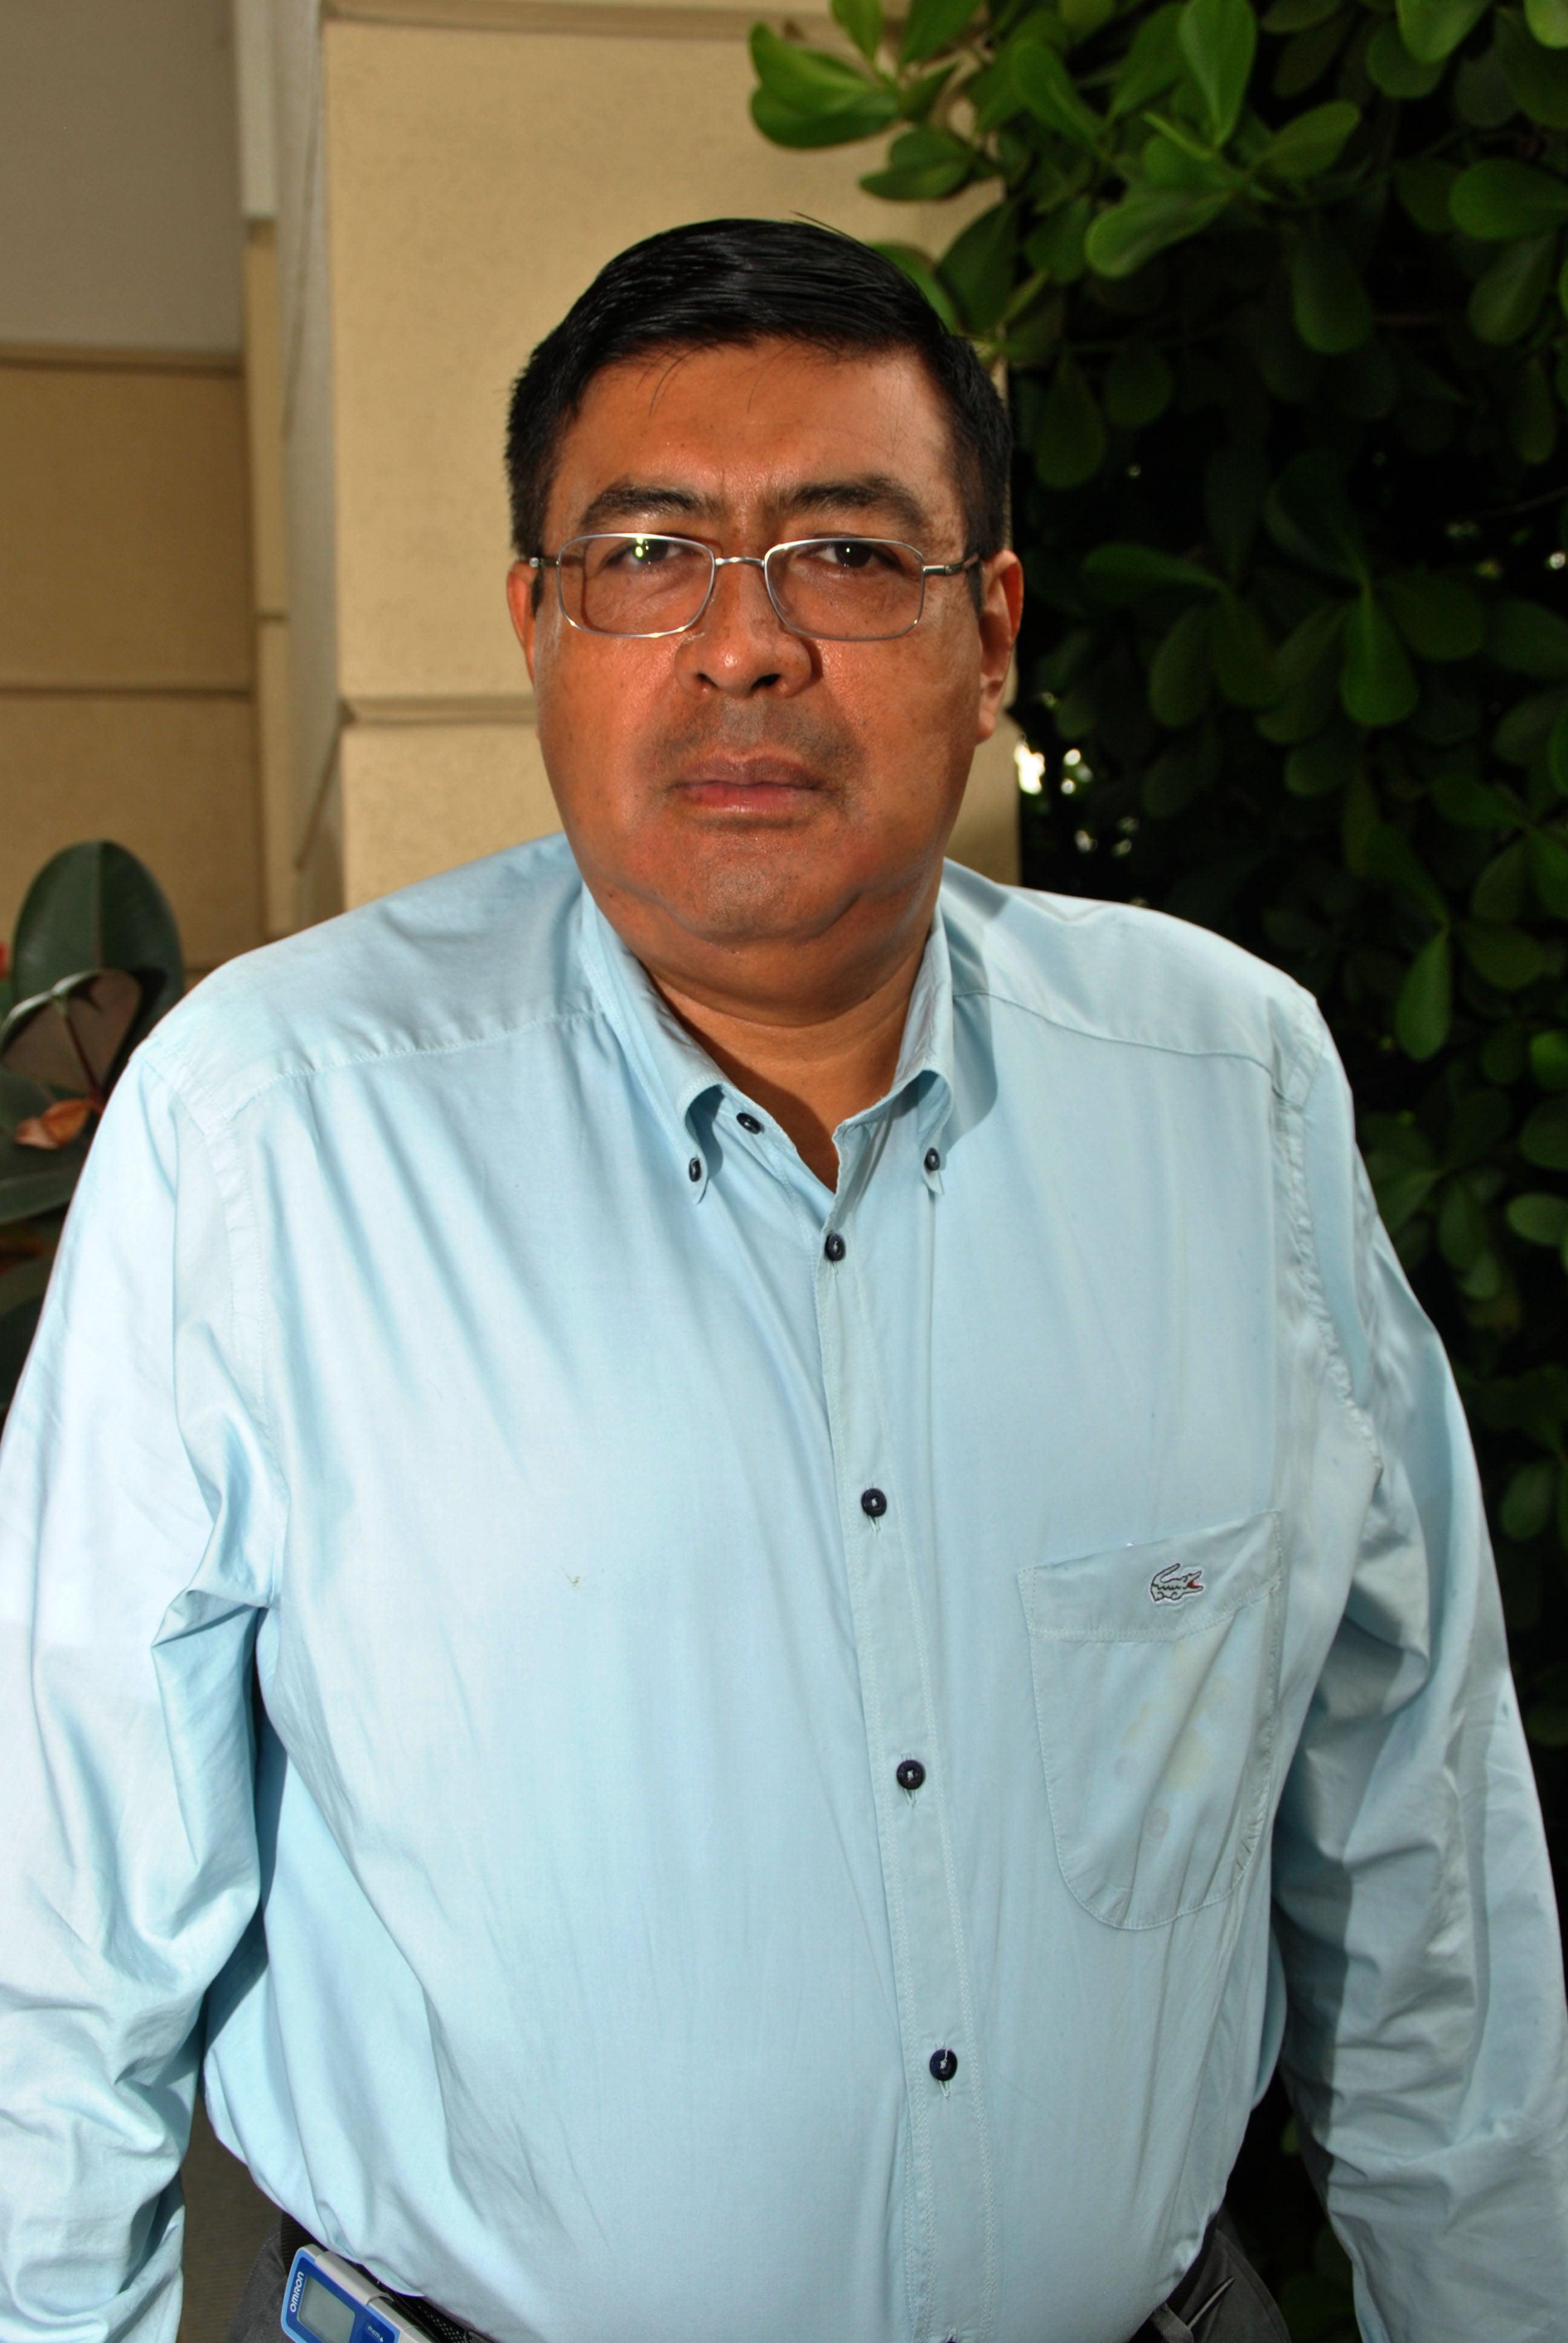 Alfonso Salazar Galeano